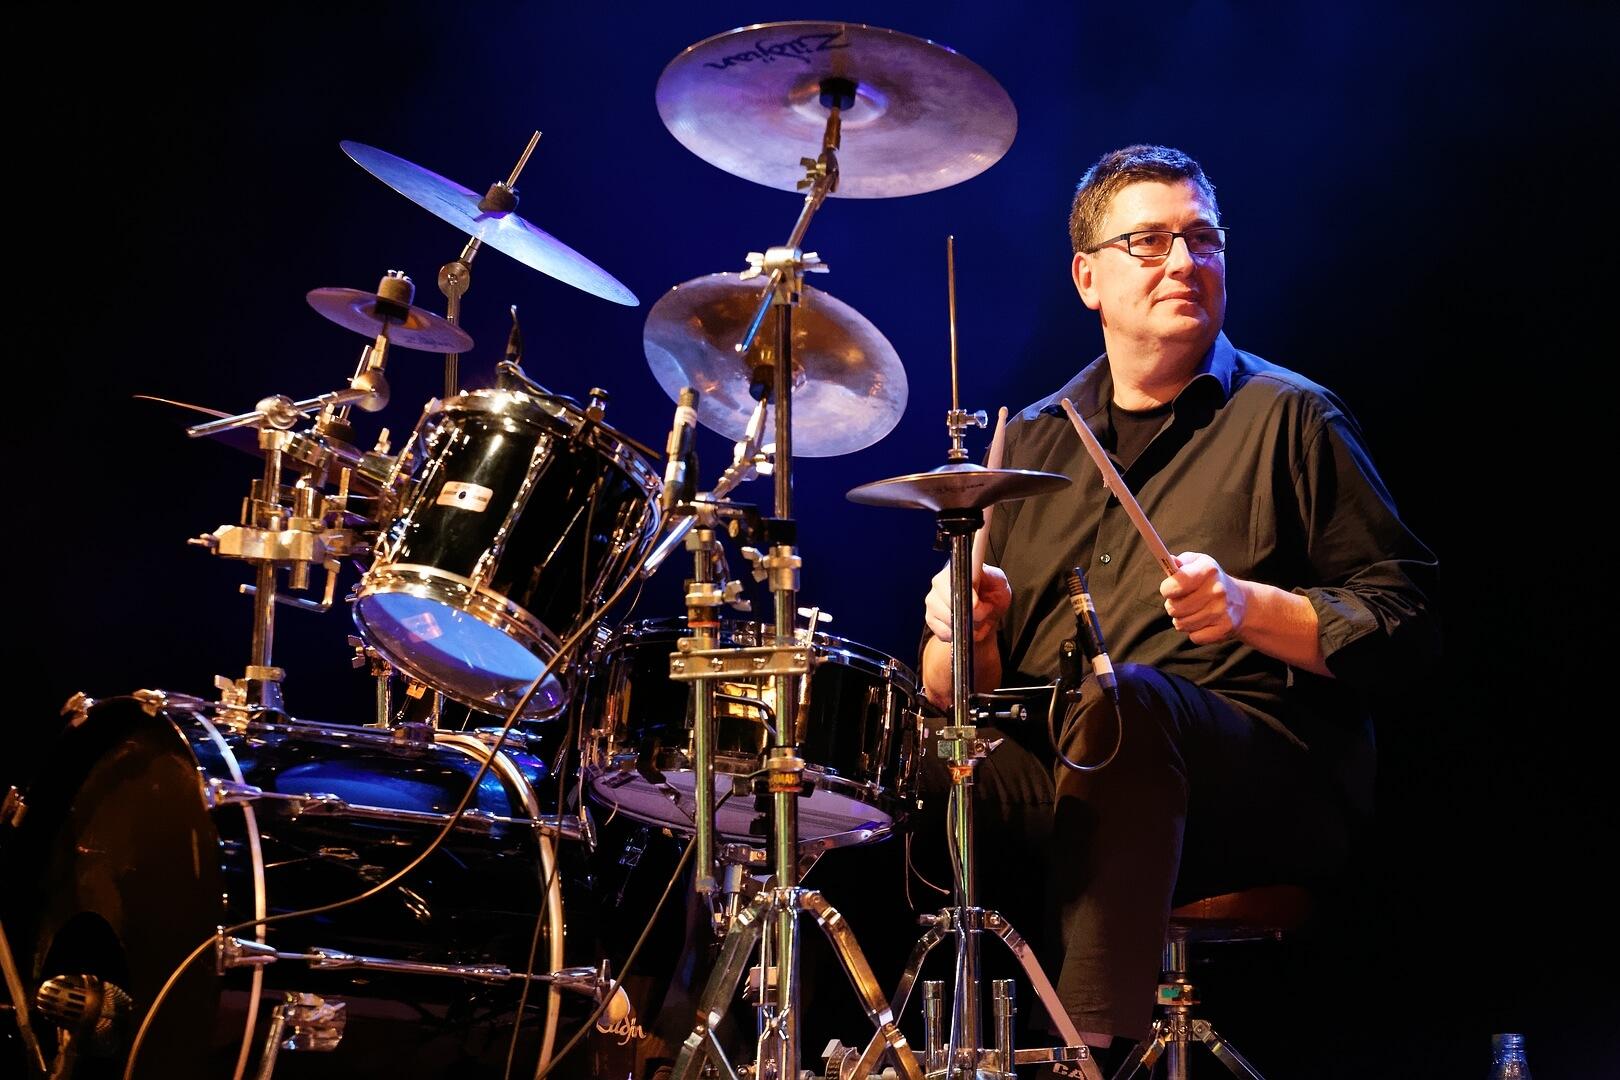 Frank Hüsch - Drums